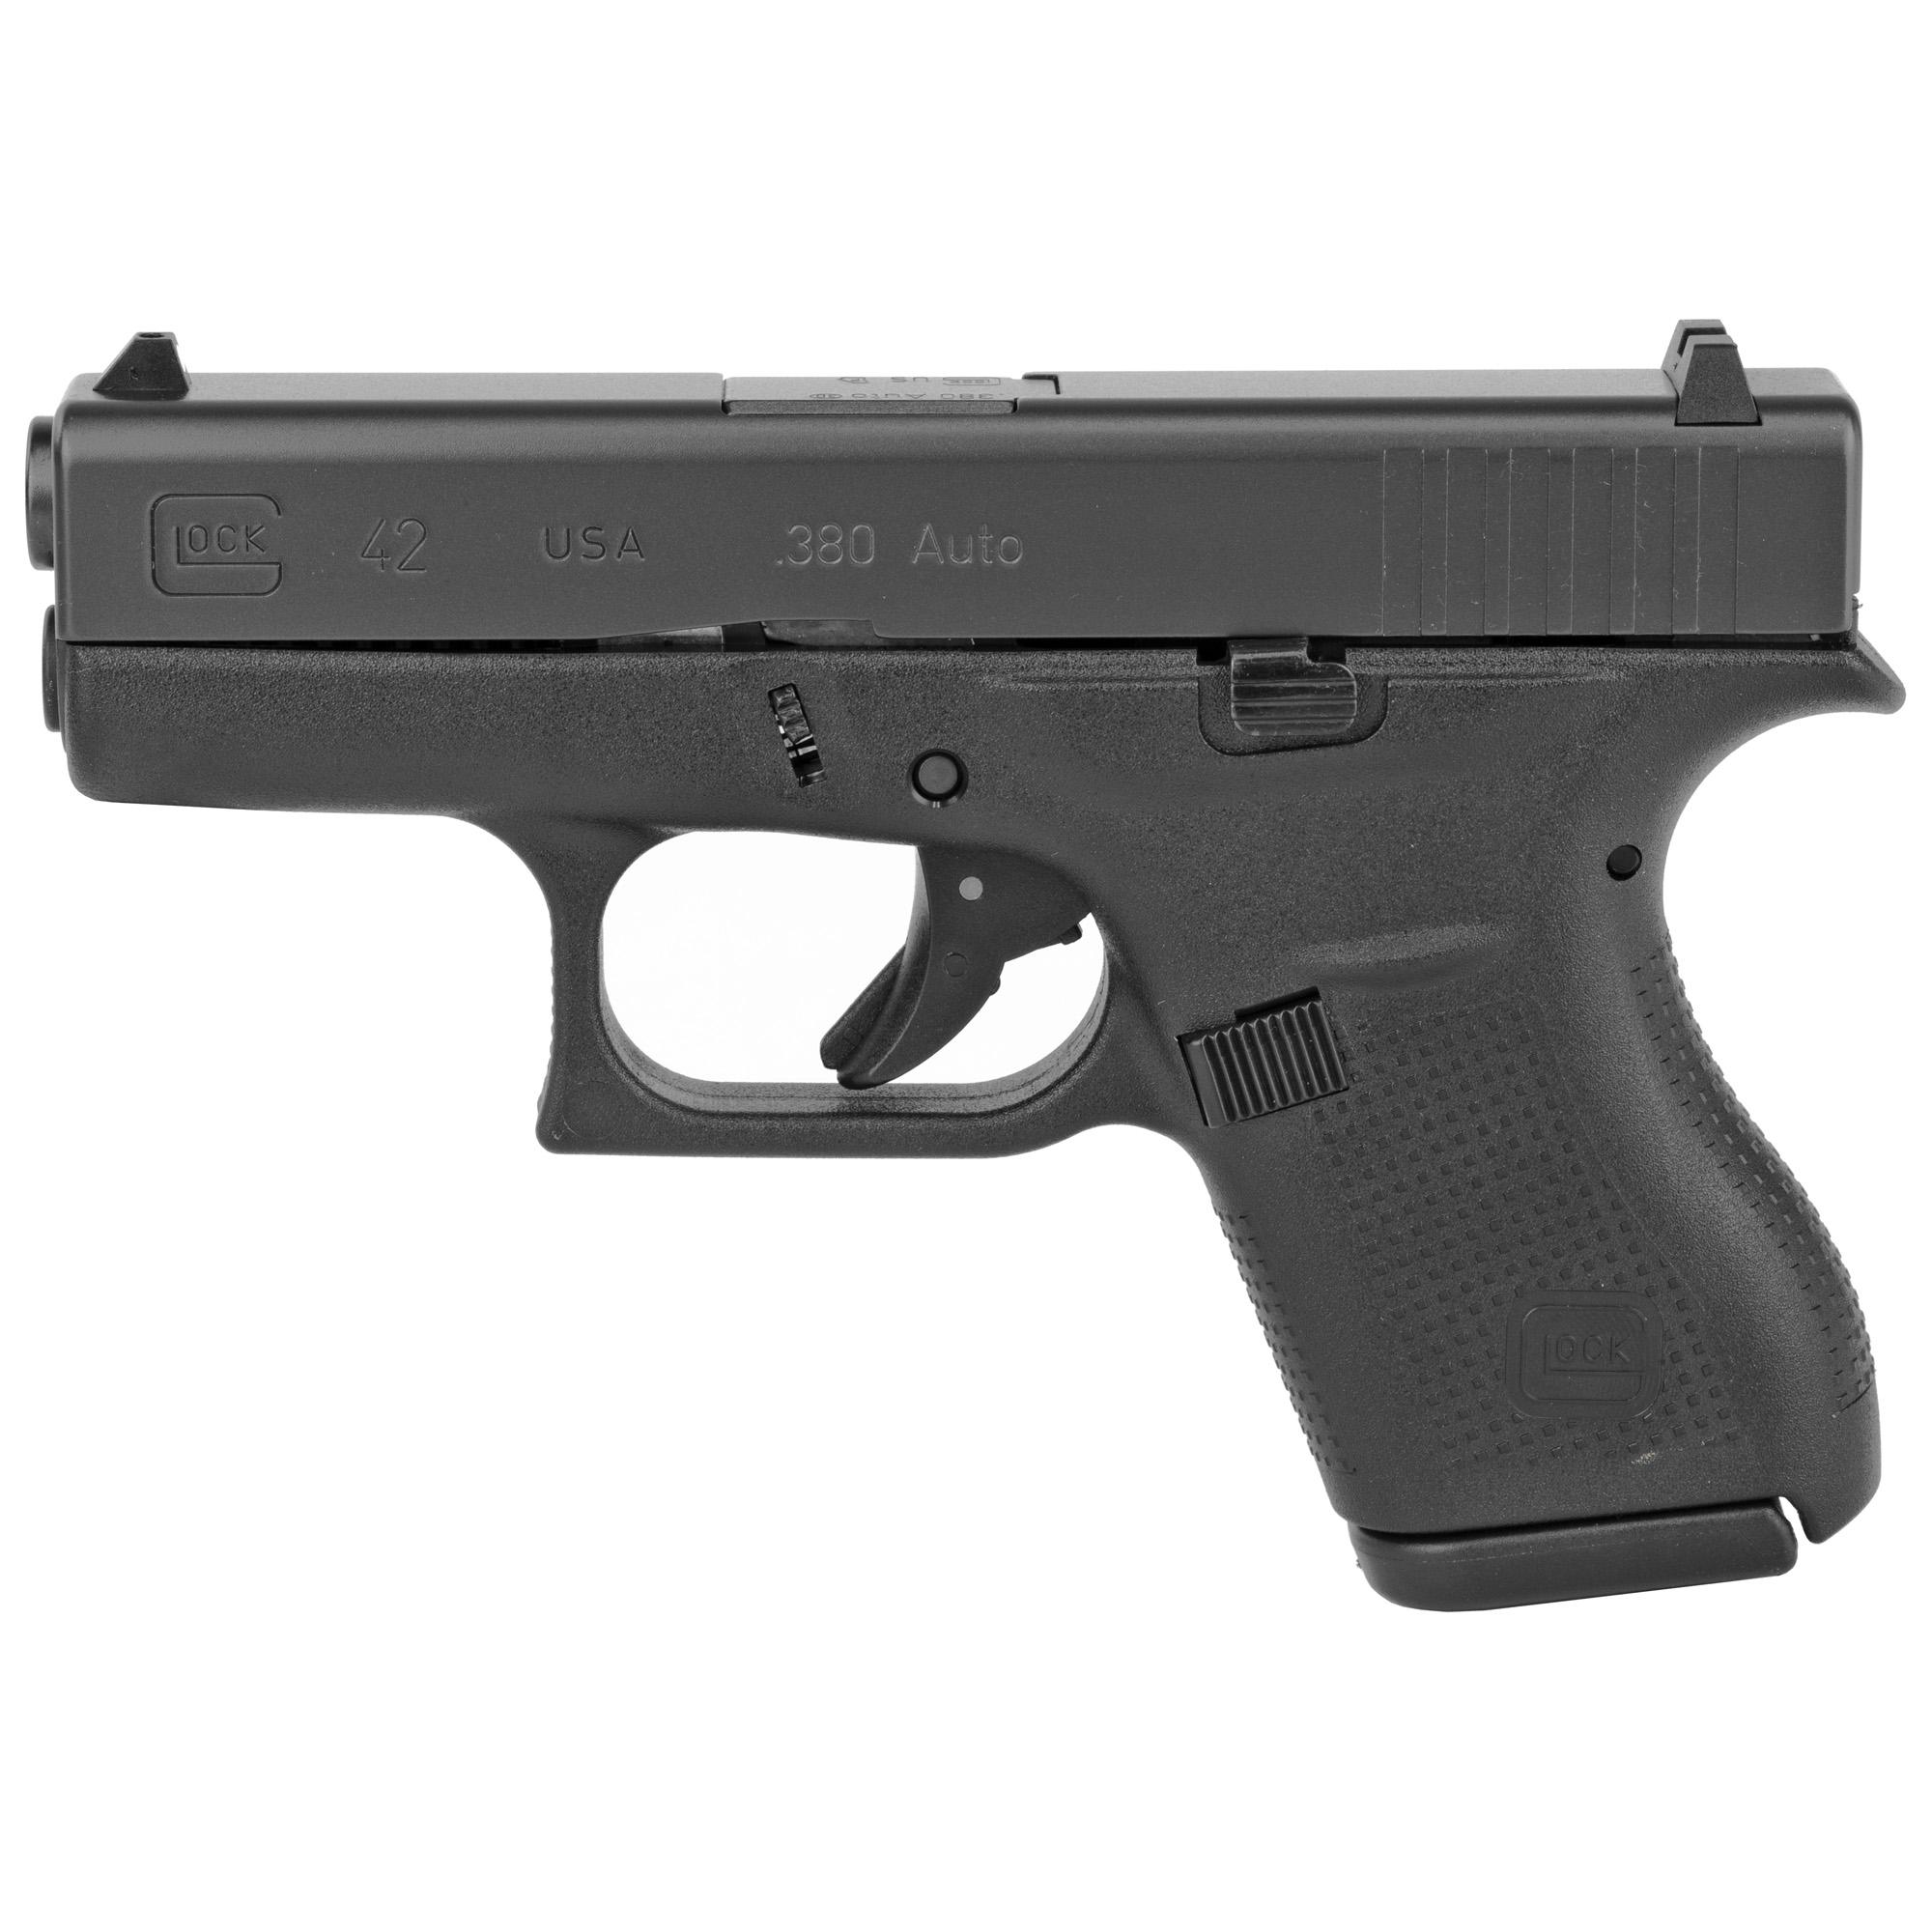 Glock 42 380acp 6rd Rebuilt